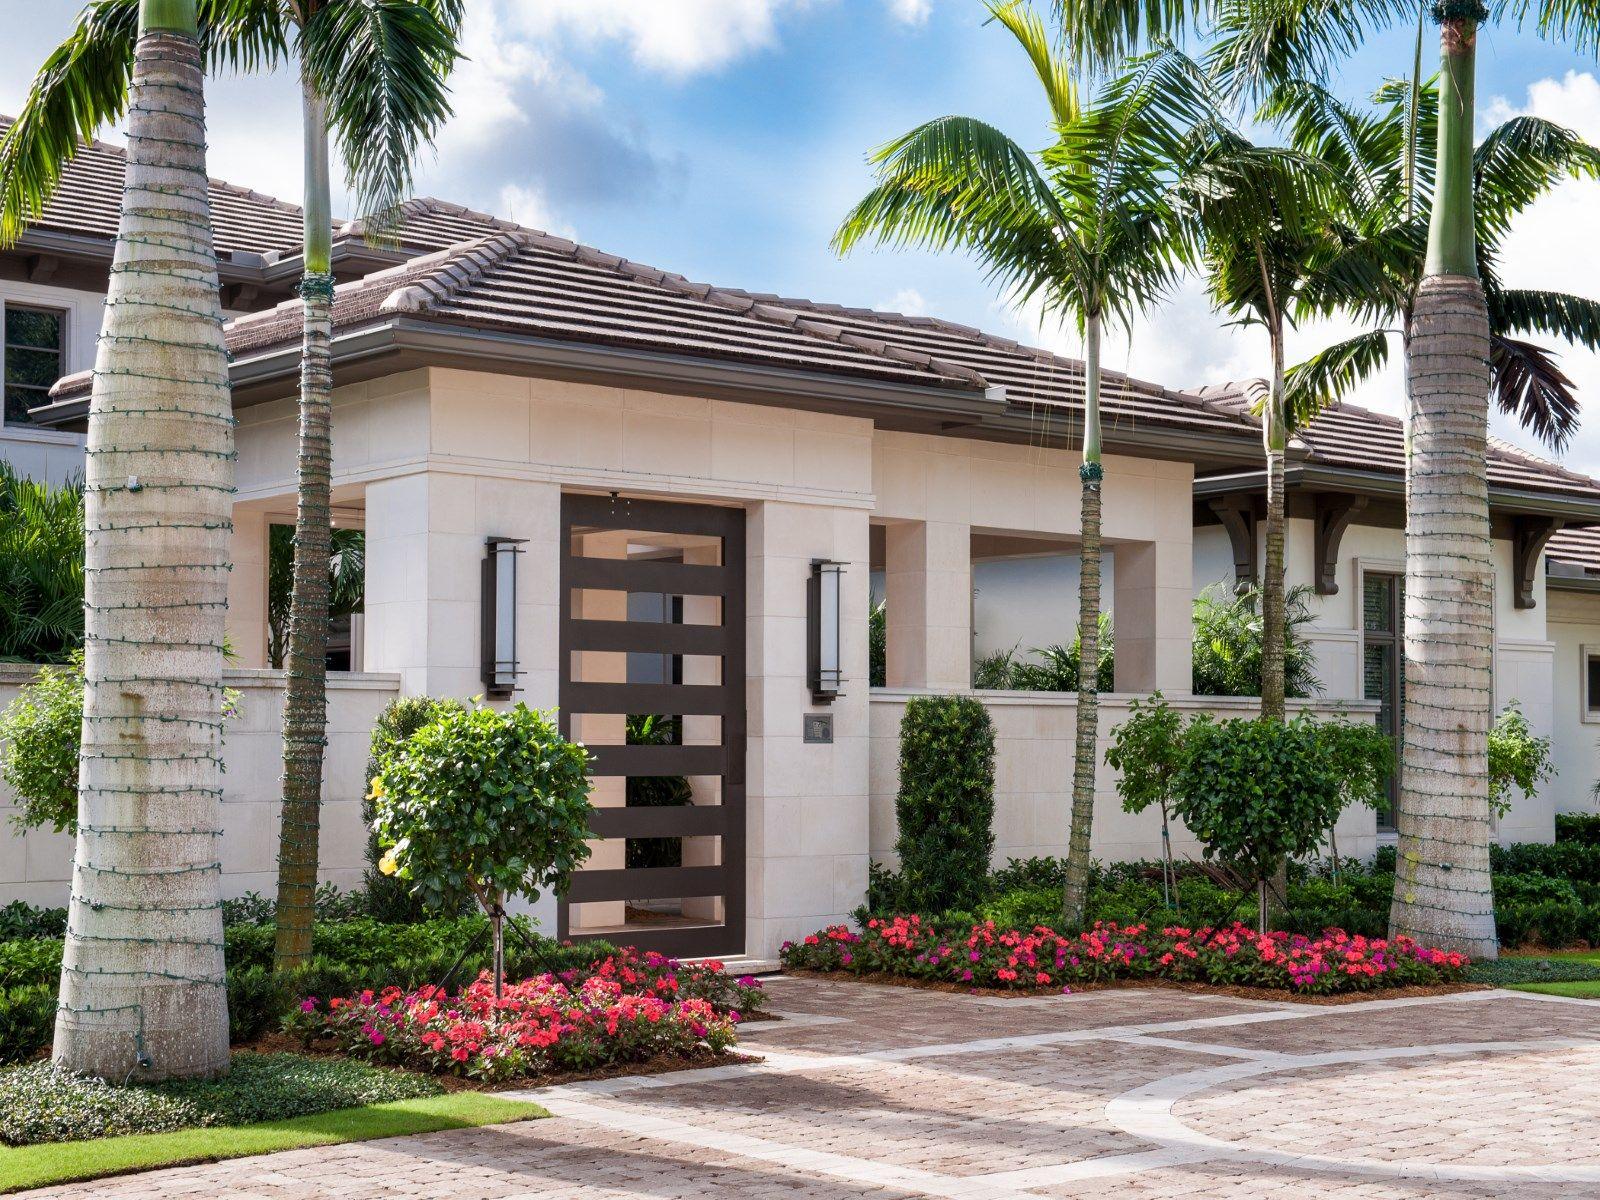 7c8ae819124bc29c964cbde3ec541a14 - New Construction Houses In Palm Beach Gardens